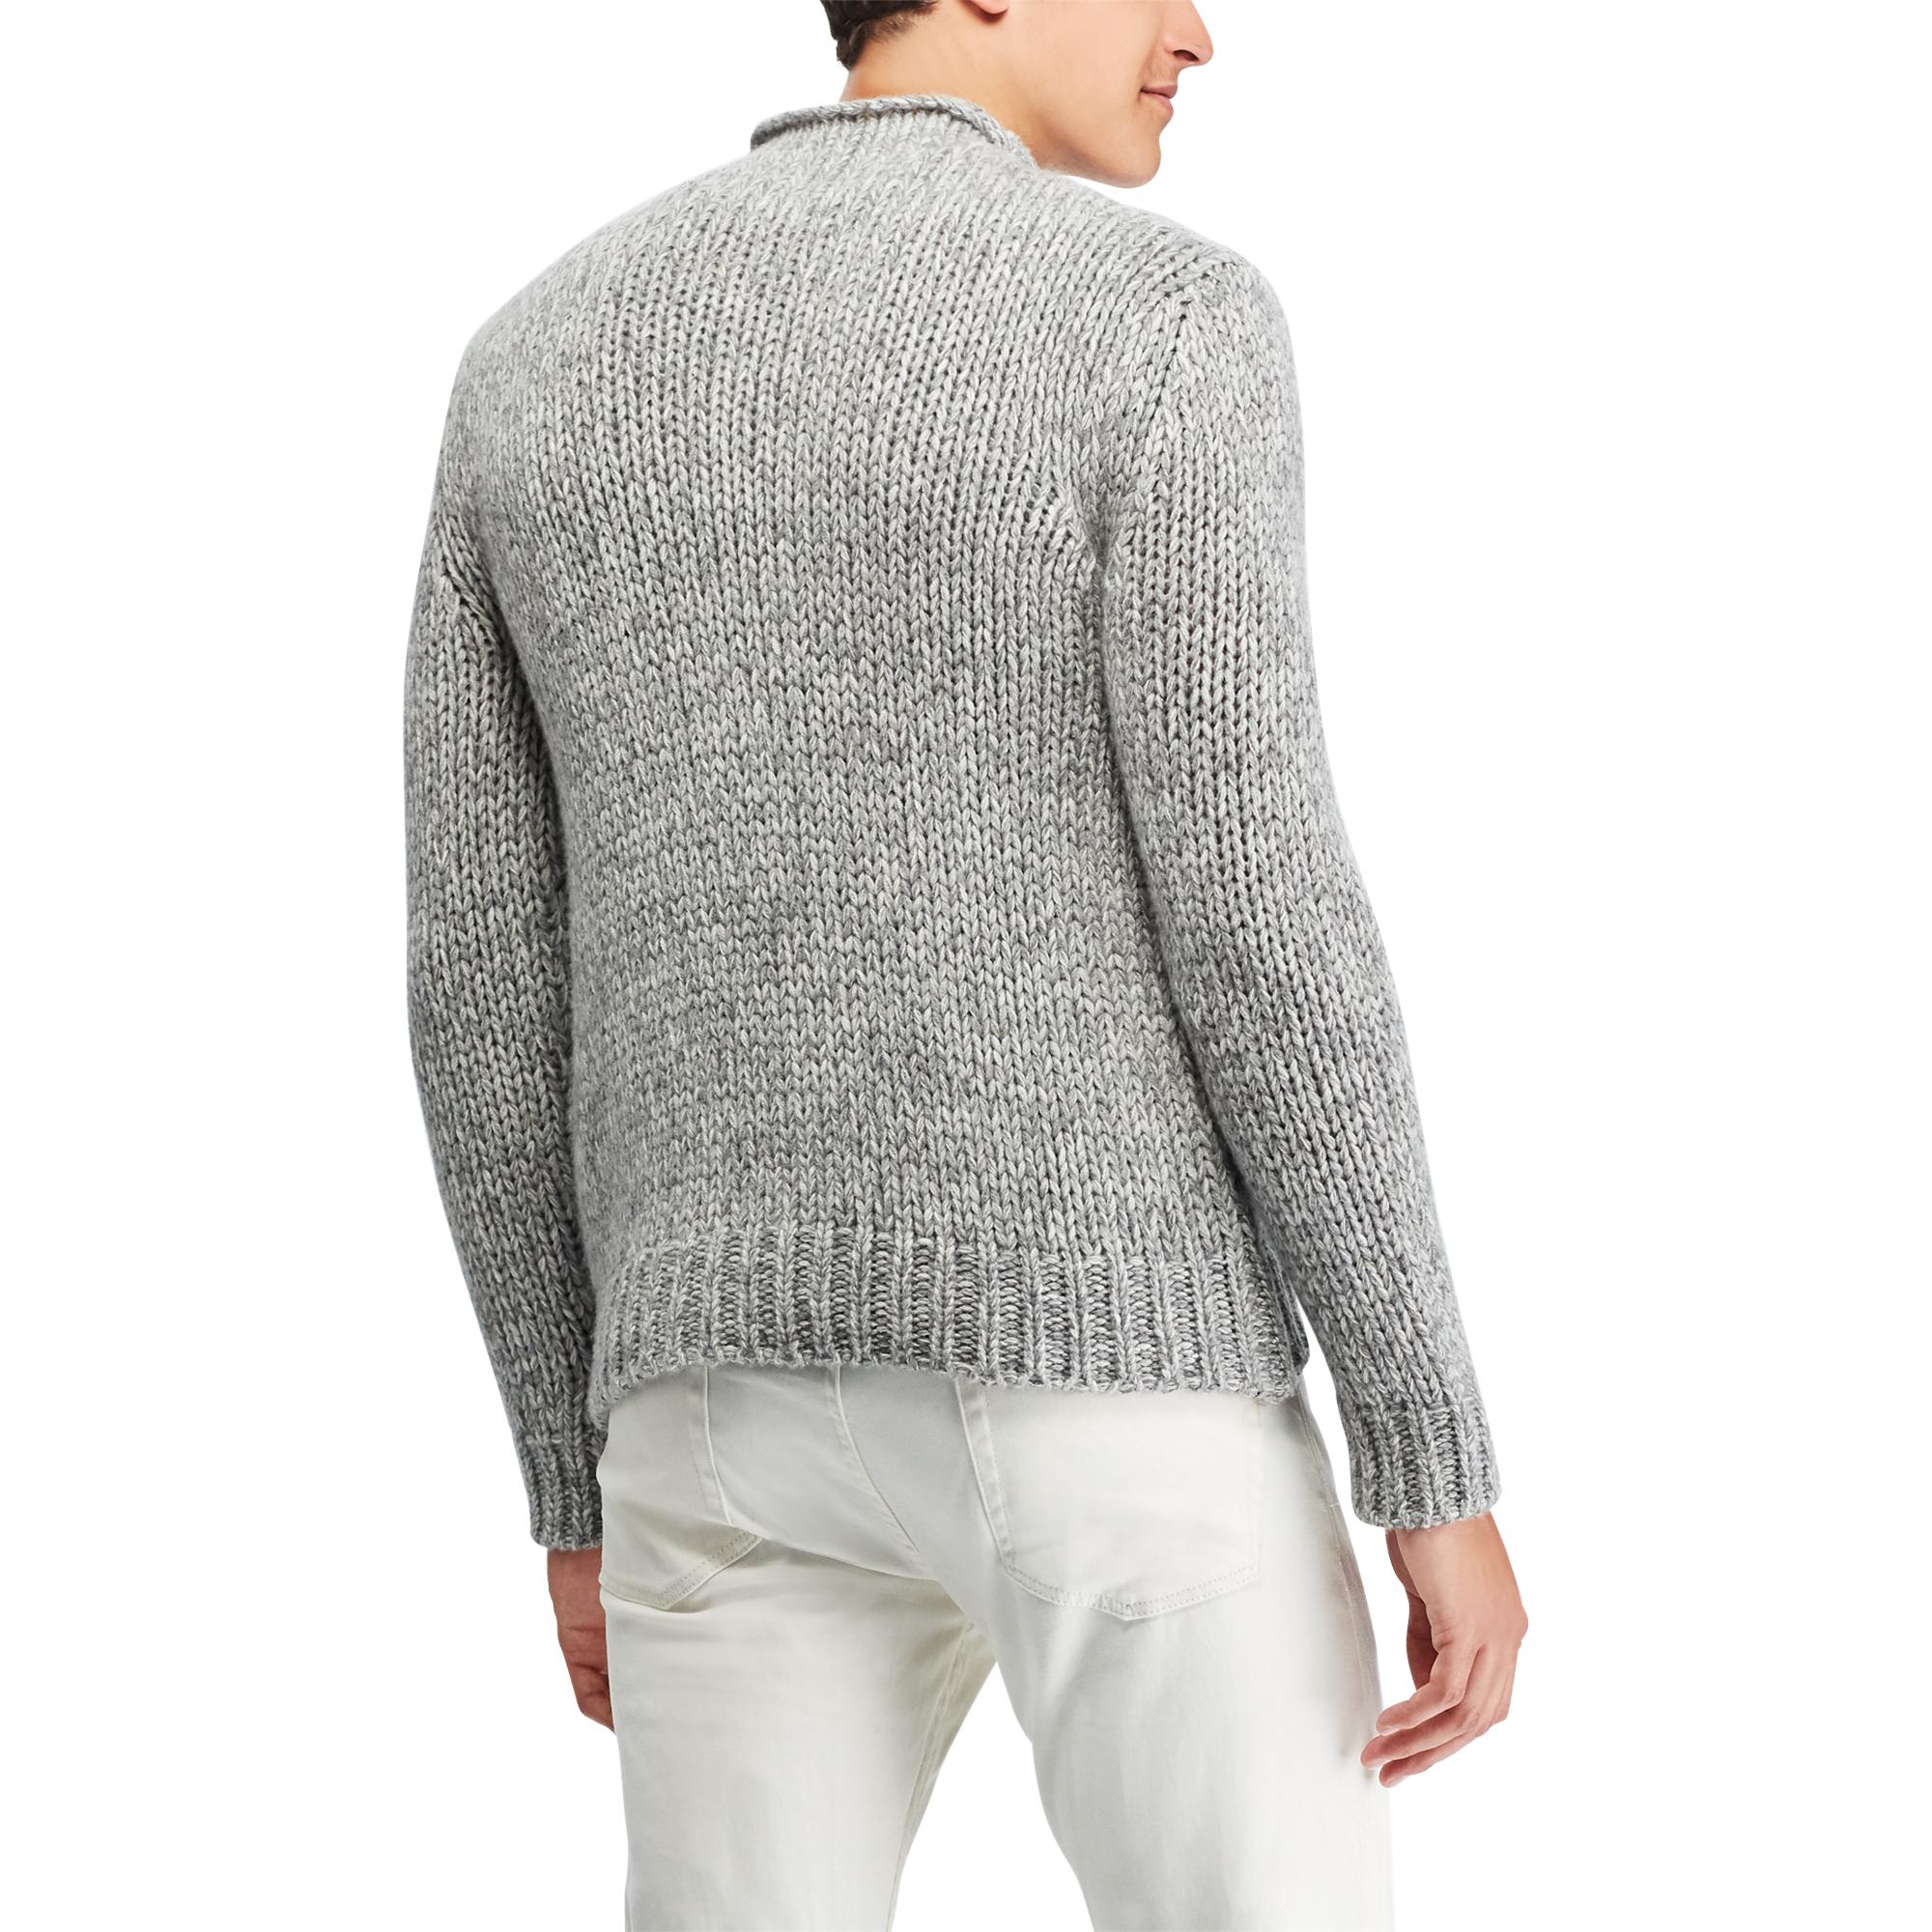 89926619 Cashmere Rollneck Sweater